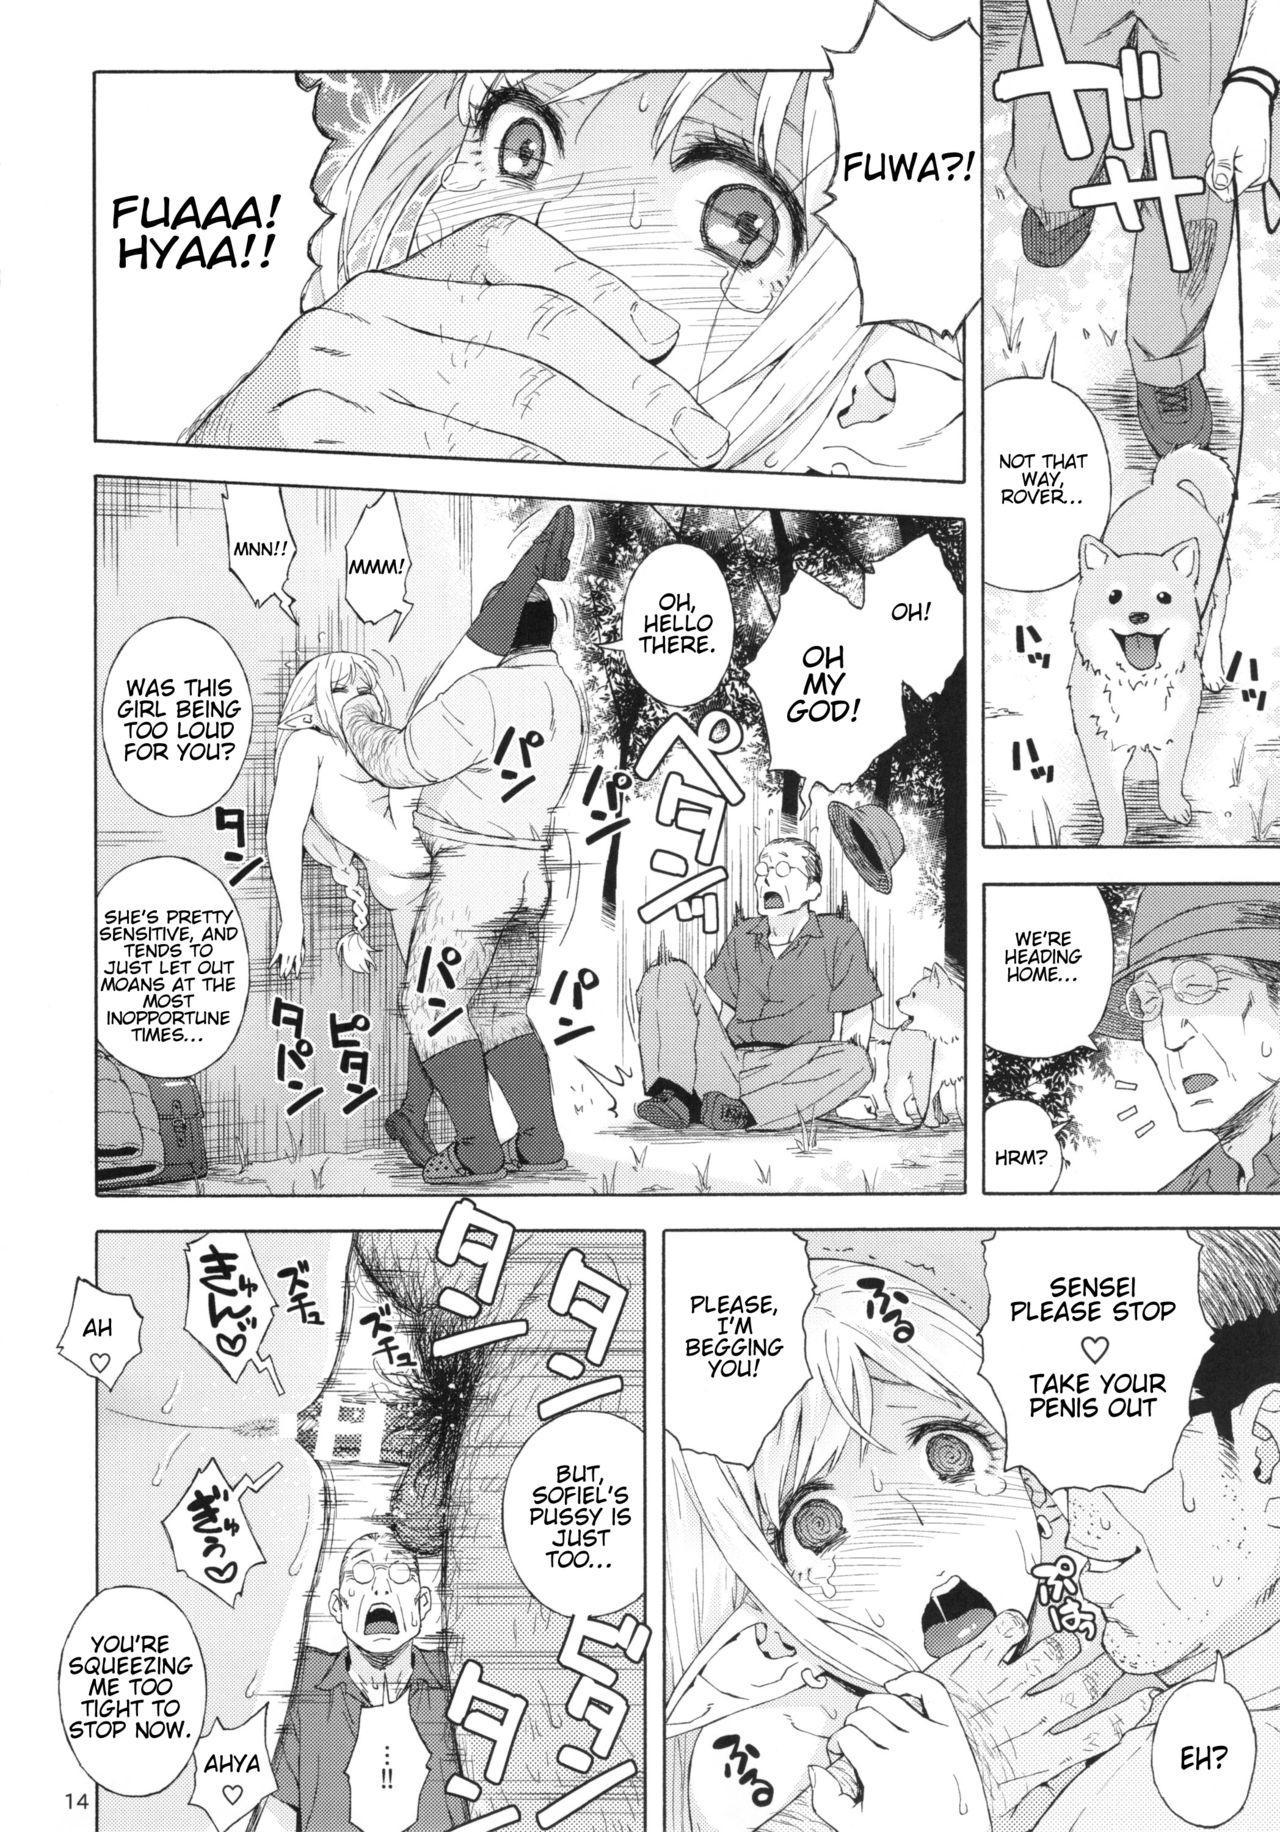 (C92) [666PROTECT (Jingrock)] Tenkousei JK Elf 3 -Houkago Yagai Jugyou- | High School Elven Transfer Student -After School Outdoor Lessons- [English] [Tremalkinger] 13